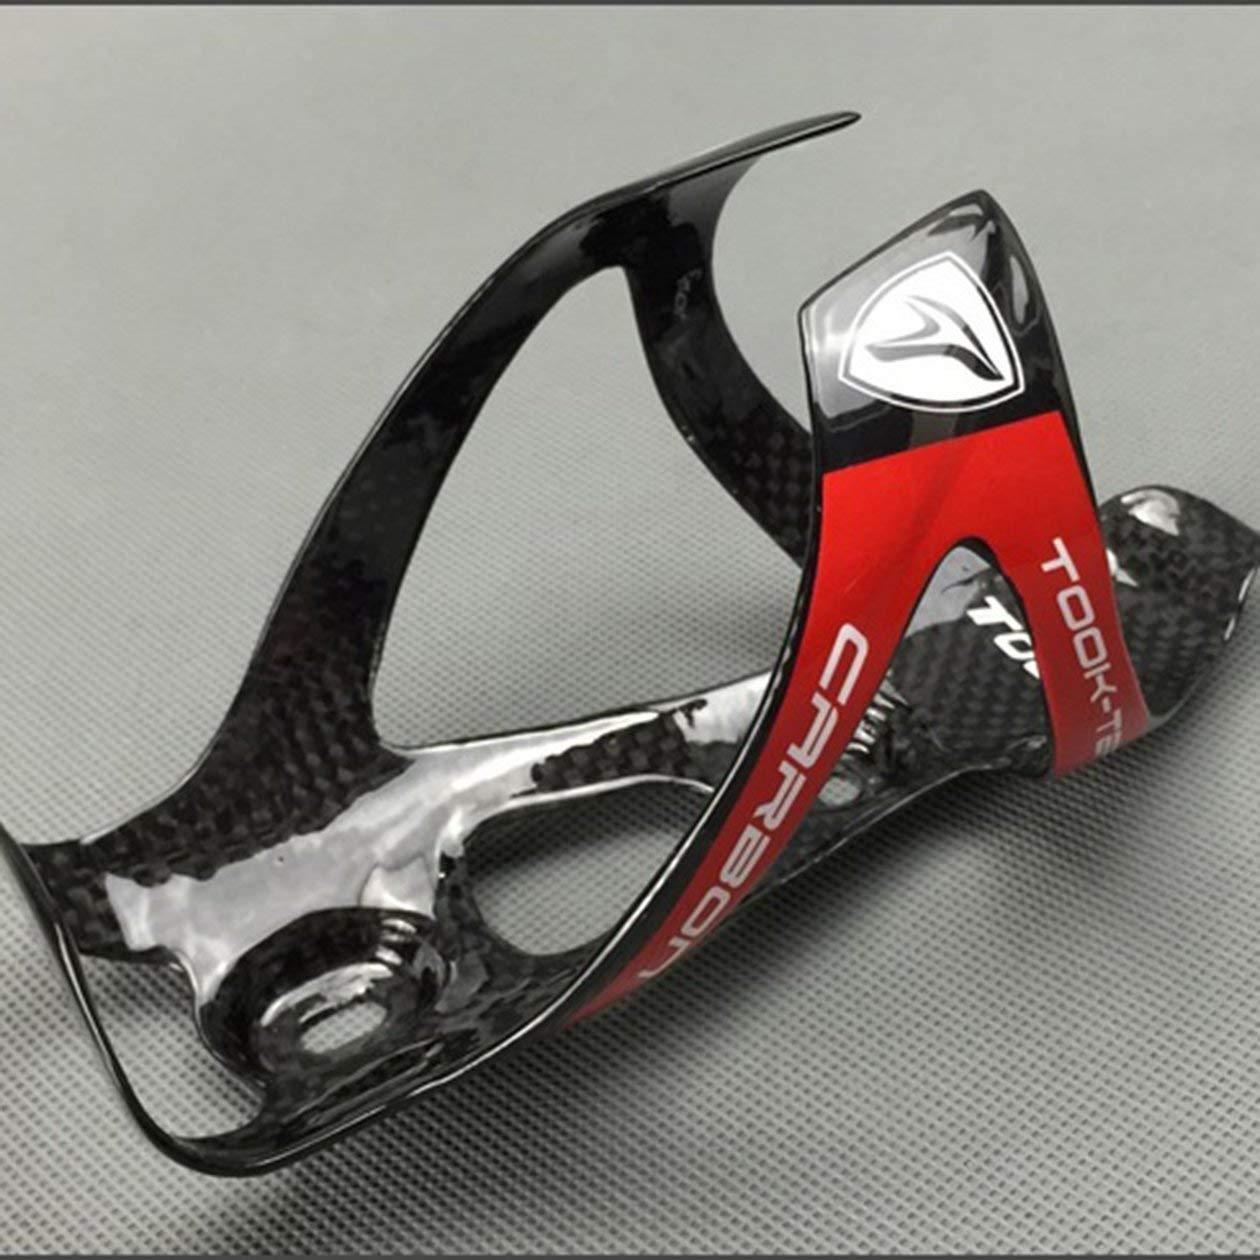 Heraihe Soporte para Botella de decantarse por Completo Ligero de Fibra de Carbono Carretera Bicicleta de monta/ña de Agua de Bicicletas Plegables Portabid/ònes Accesorios de Bicicletas